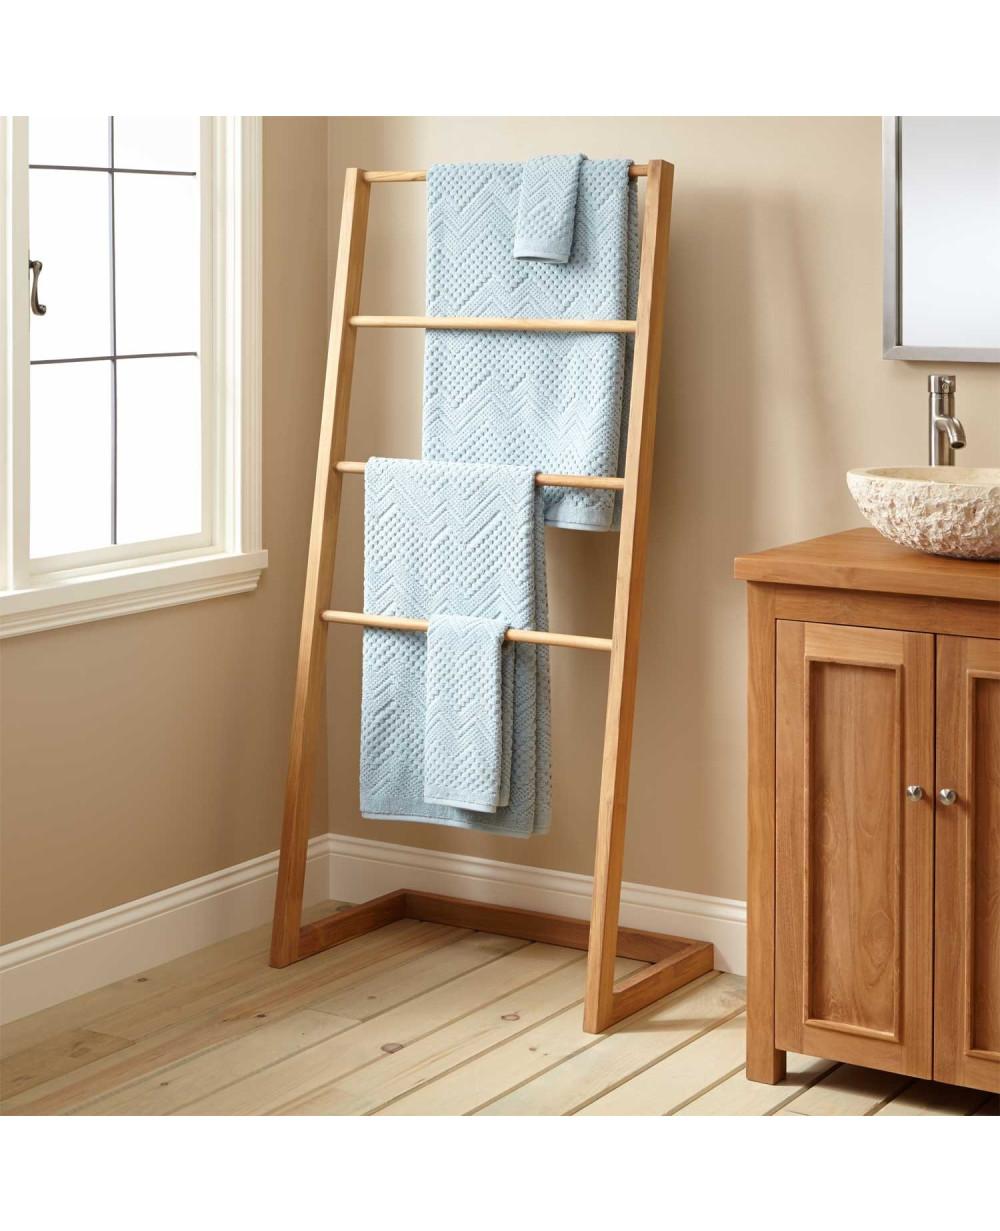 Buy Online Sylvia Teak Towel Hanger I Rico Plato